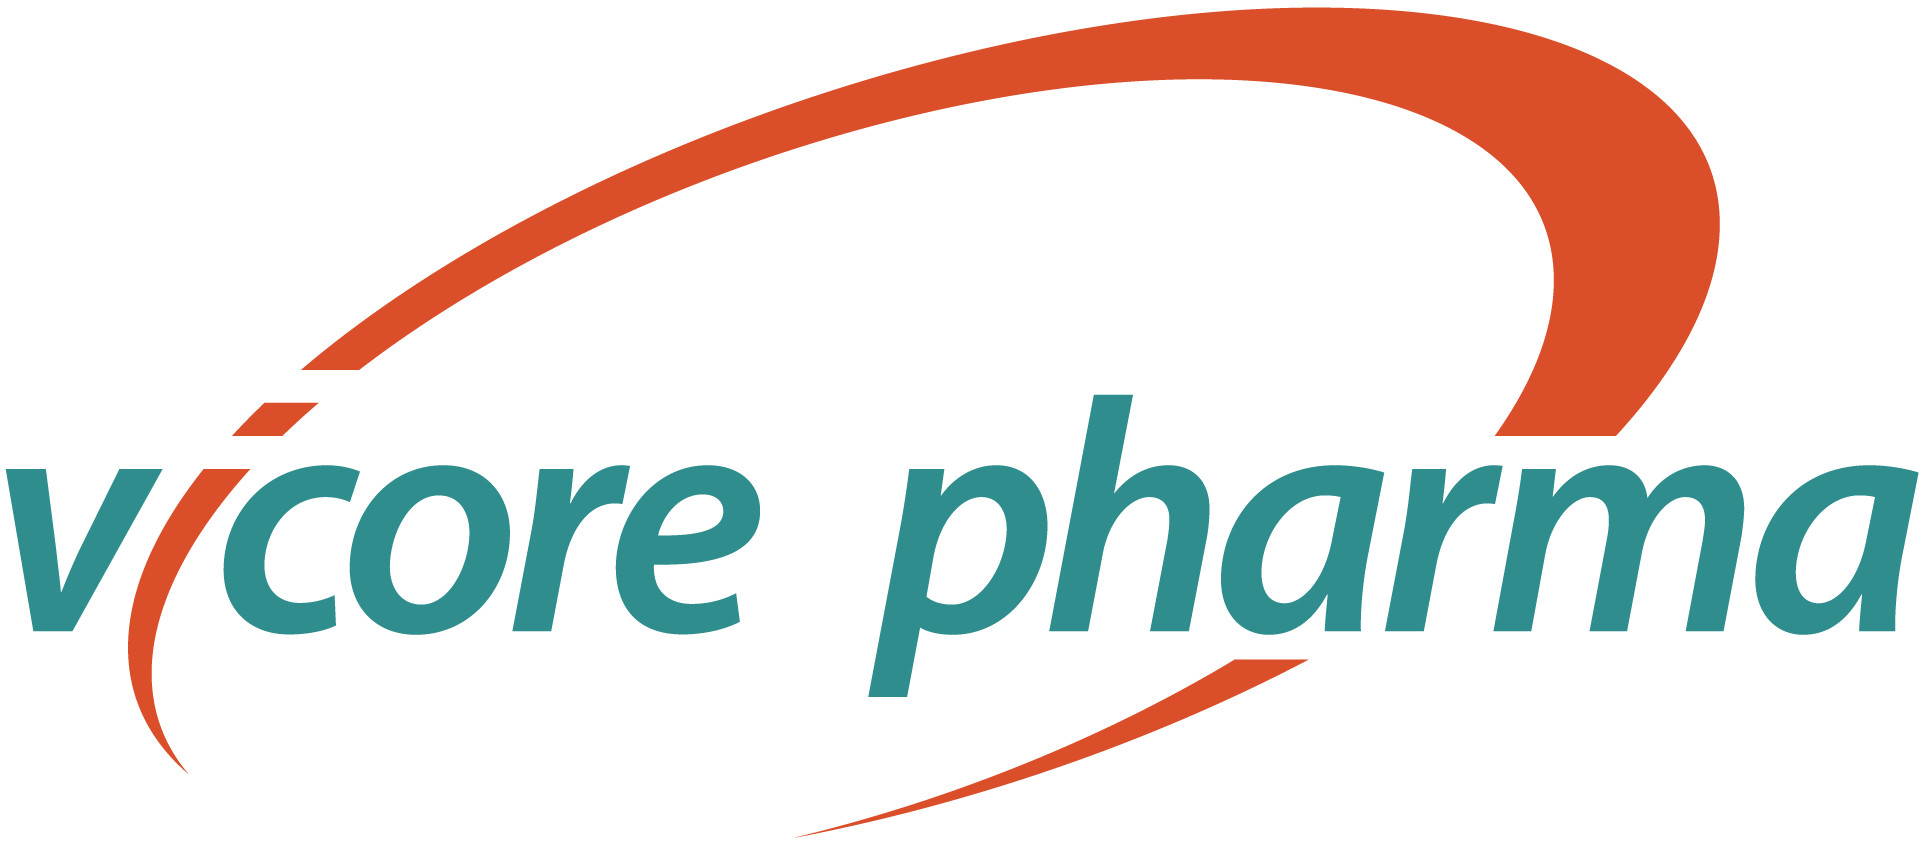 Vicore Pharma.jpg